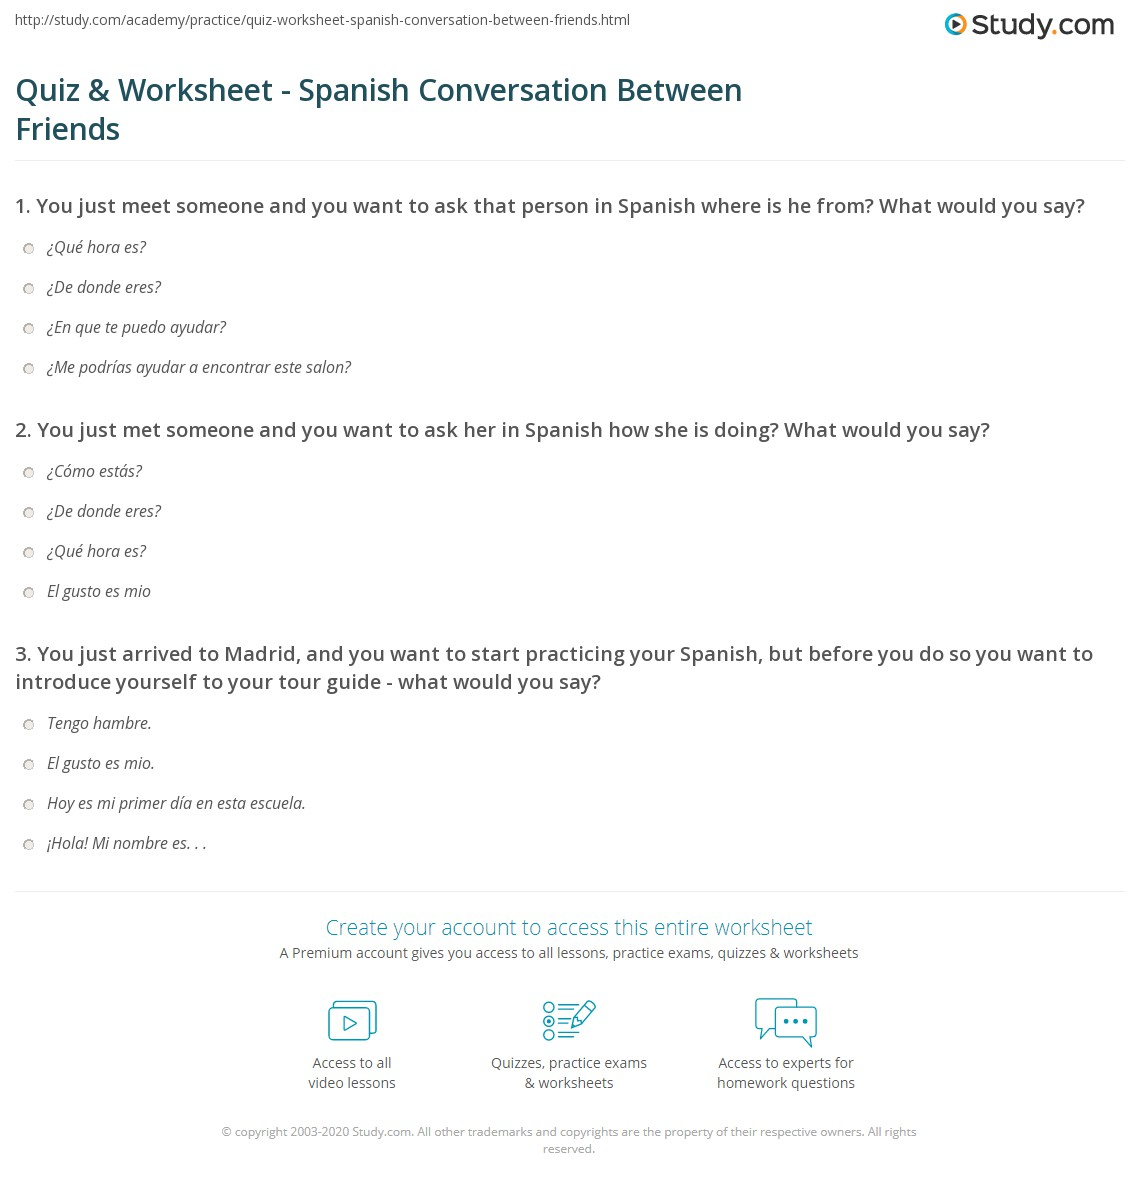 How do I say I met someone in Spanish?